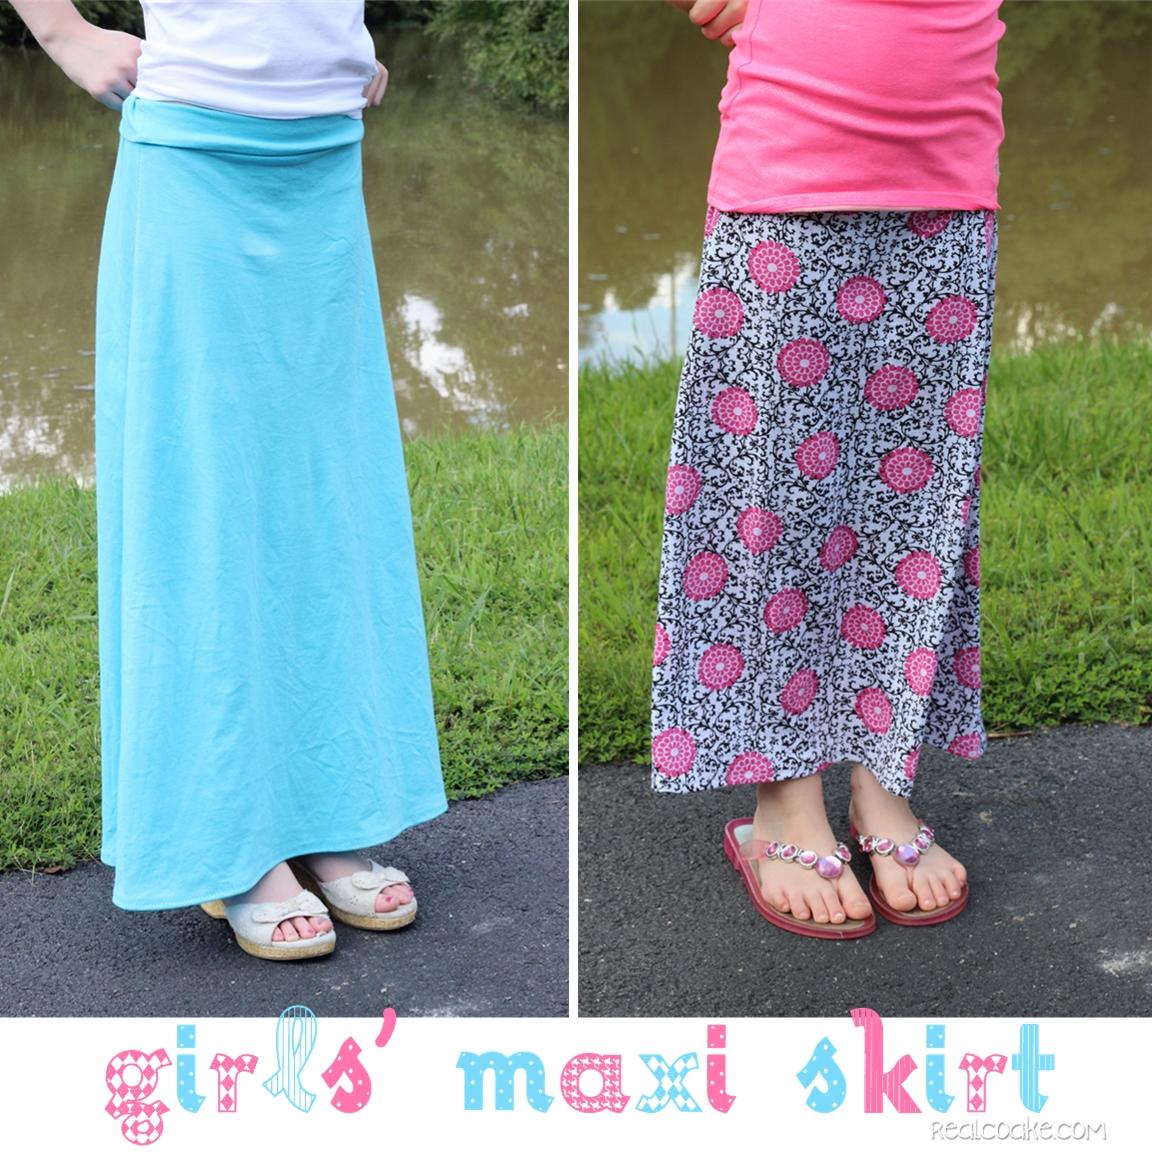 Awesome Pattern U2014 The Anywhere Skirt! U2014 For Women + Teens + Girls U2013 MADE EVERYDAY